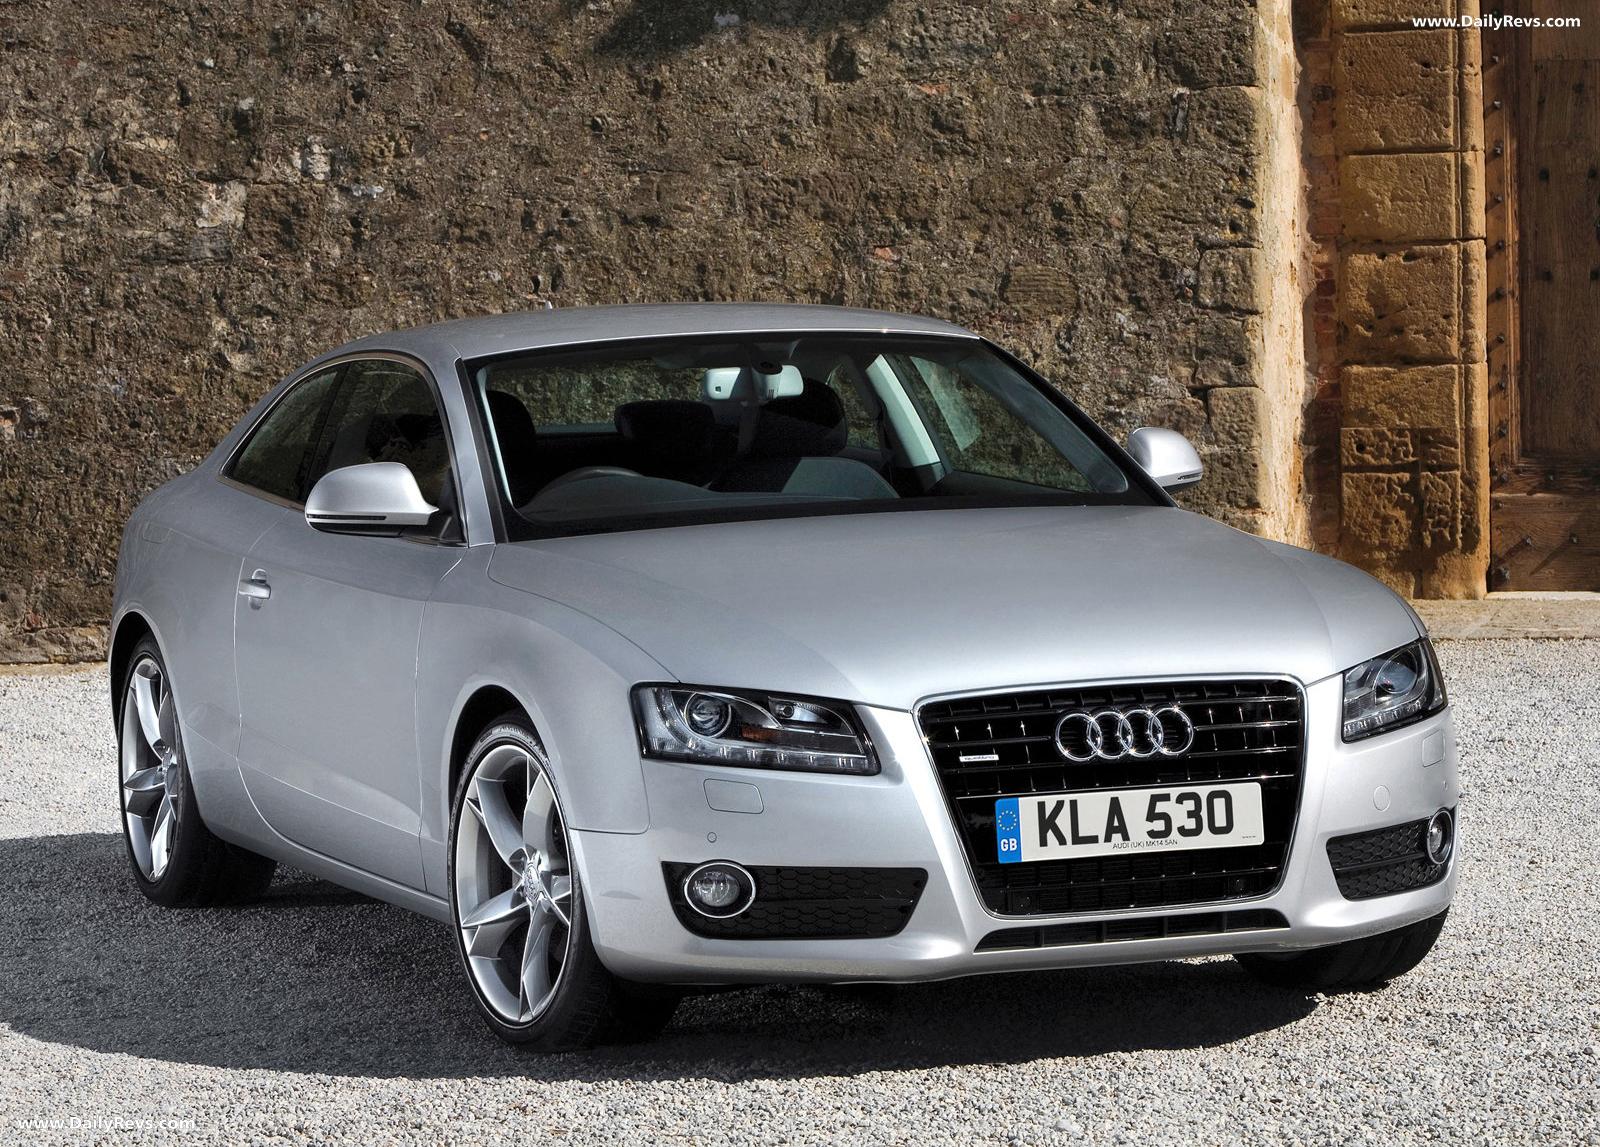 2008 Audi A5 3.0 TDI quattro - HD Pictures, Videos, Specs ...